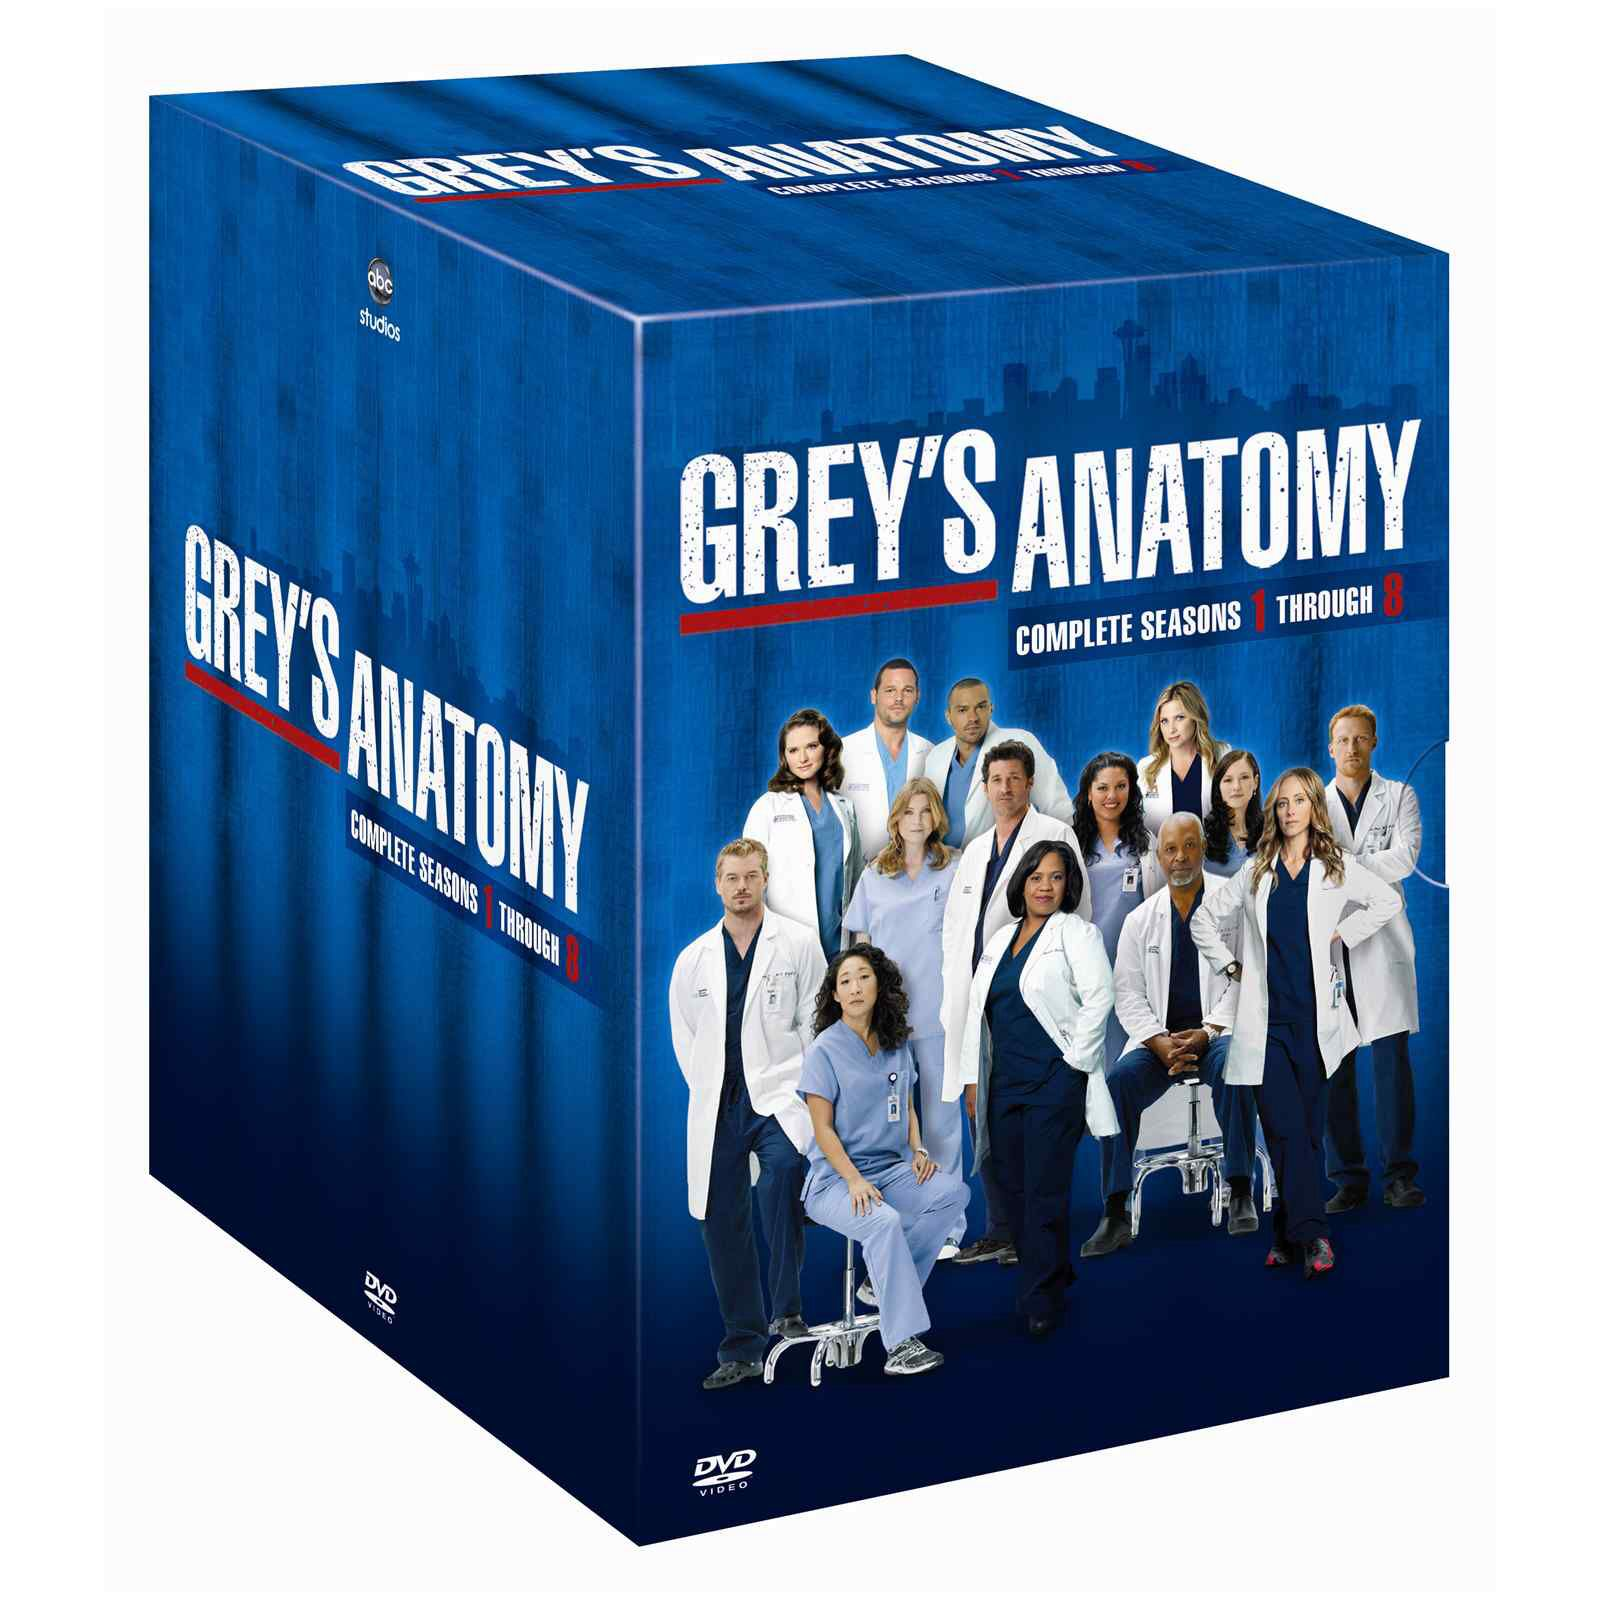 Greys anatomy box set greys anatomy greys anatomy